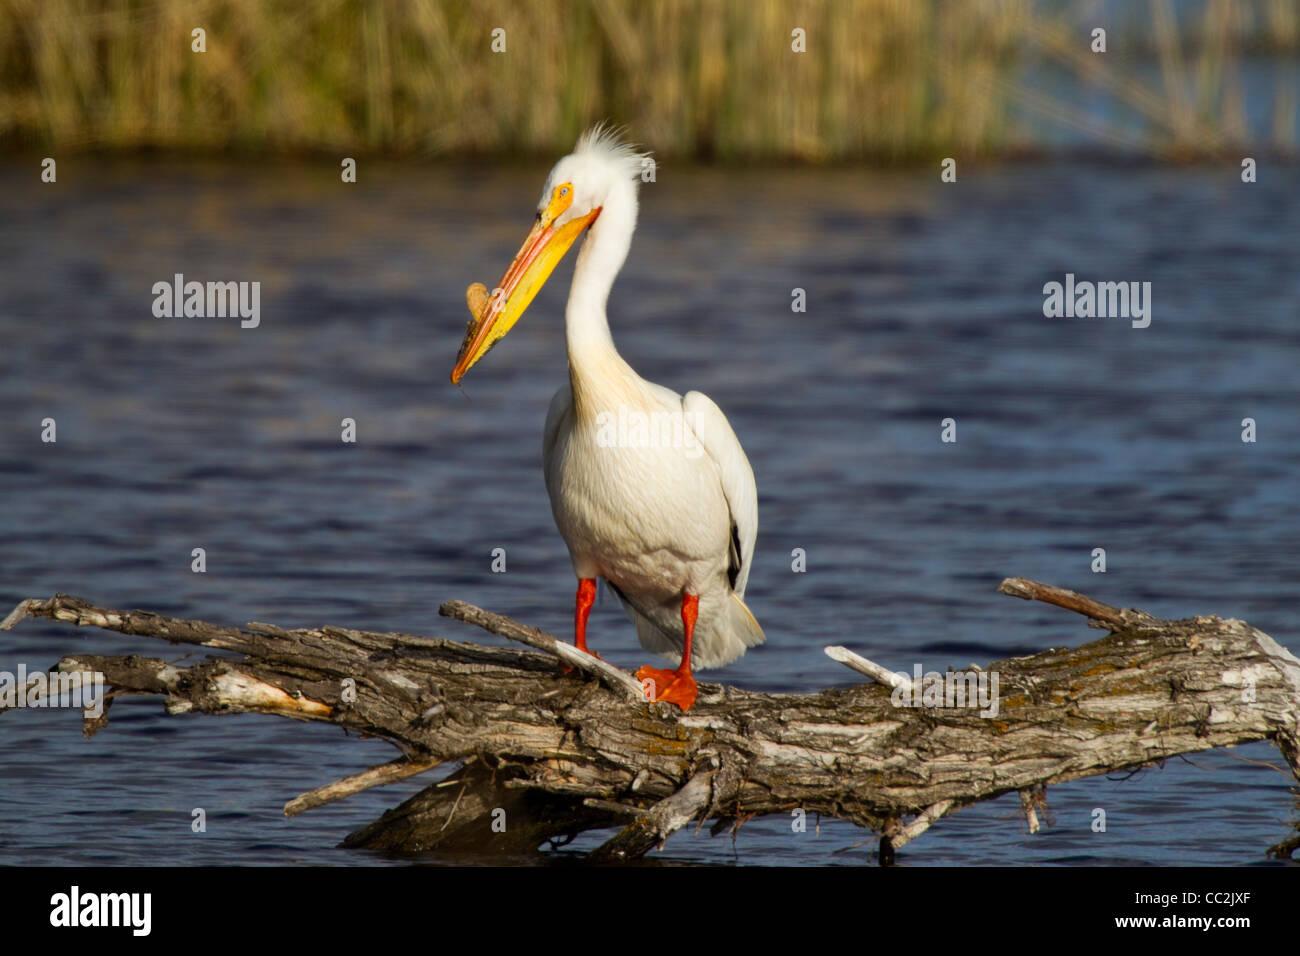 American White Pelican Pelecanus erythrorhynchos Lower Klamath Lake National Widlife Refuge, California, Unites - Stock Image